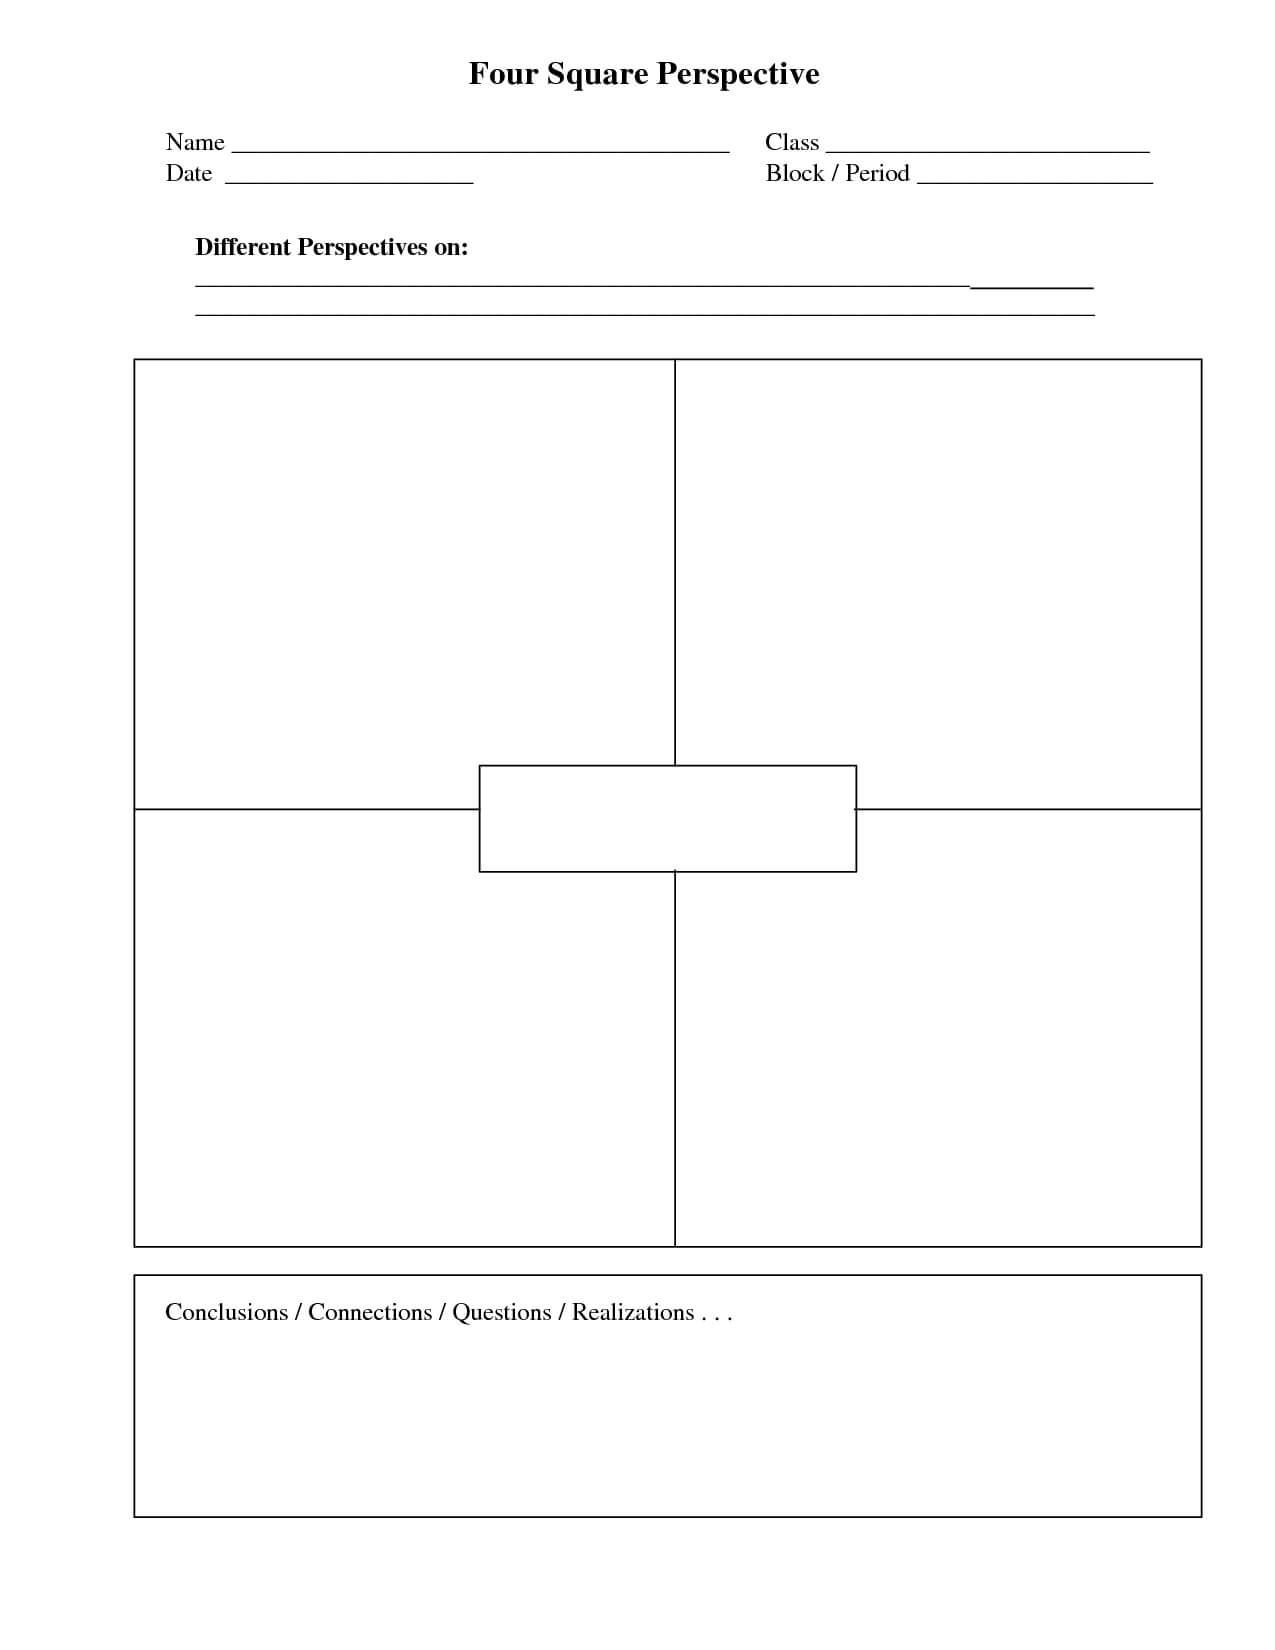 Four Square Writing Template Printable | Four Square Intended For Blank Four Square Writing Template